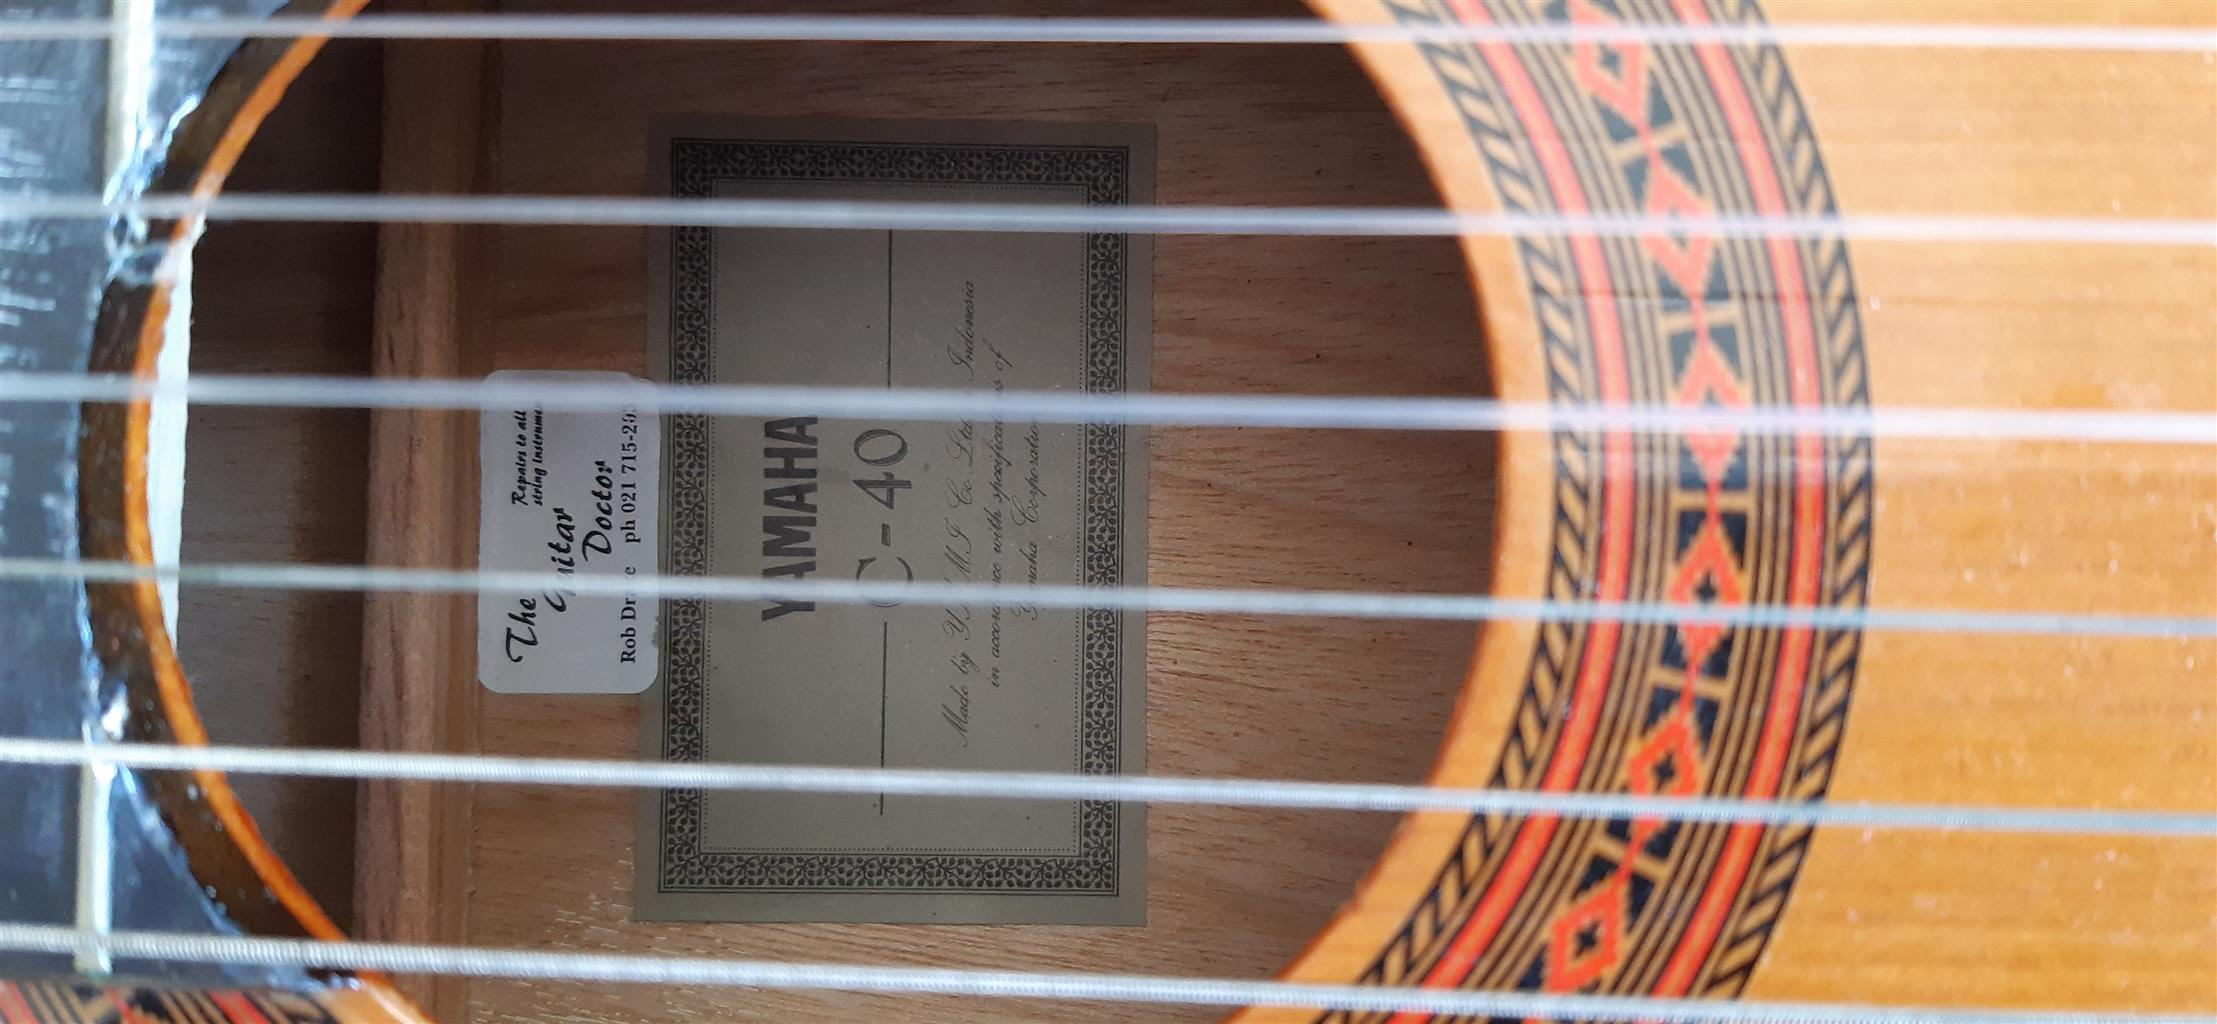 Yamaha guitar for sale